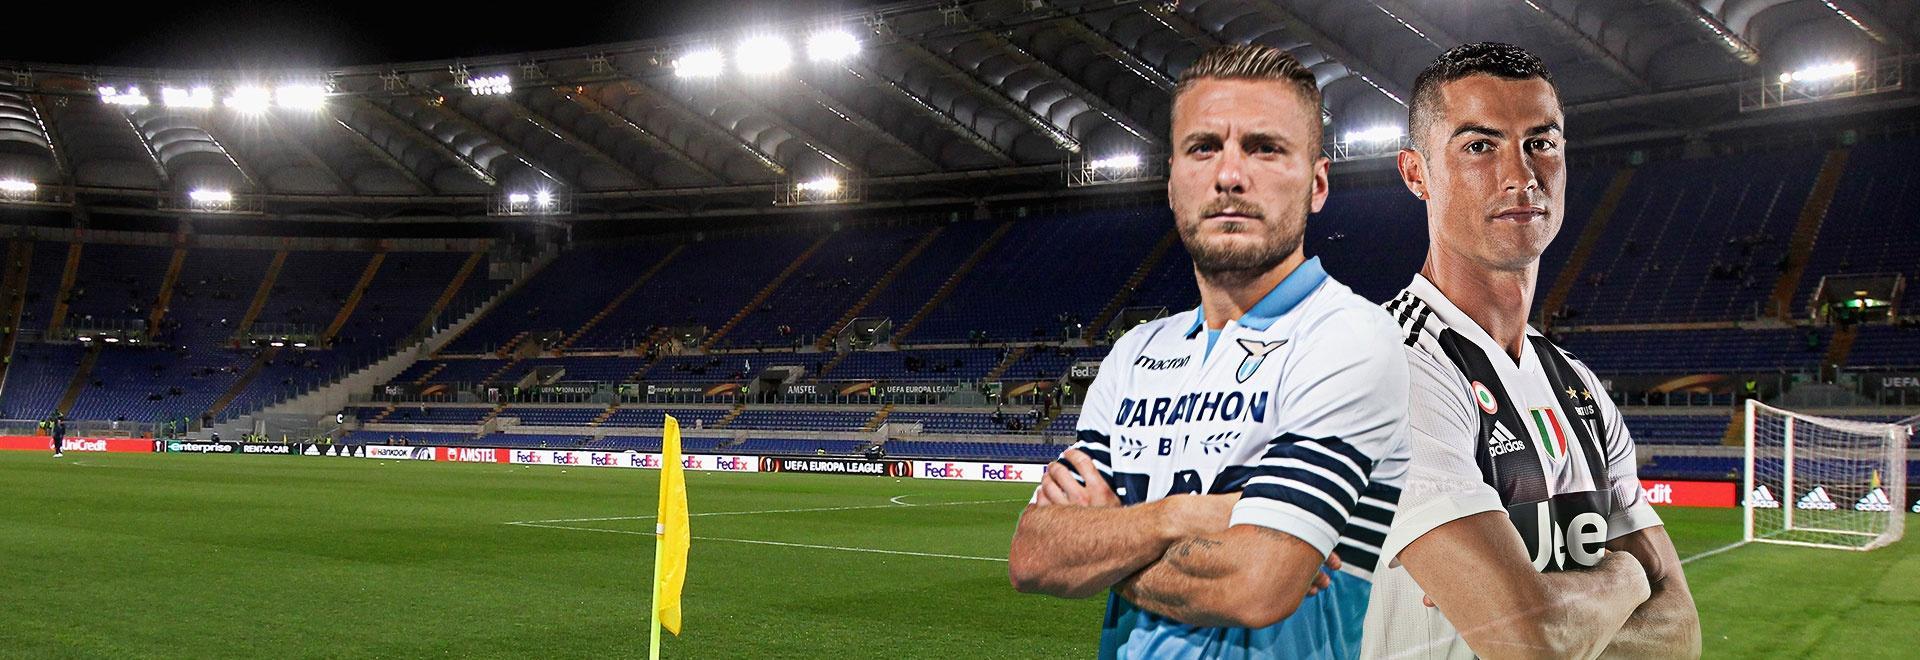 Lazio - Juventus. 21a g.